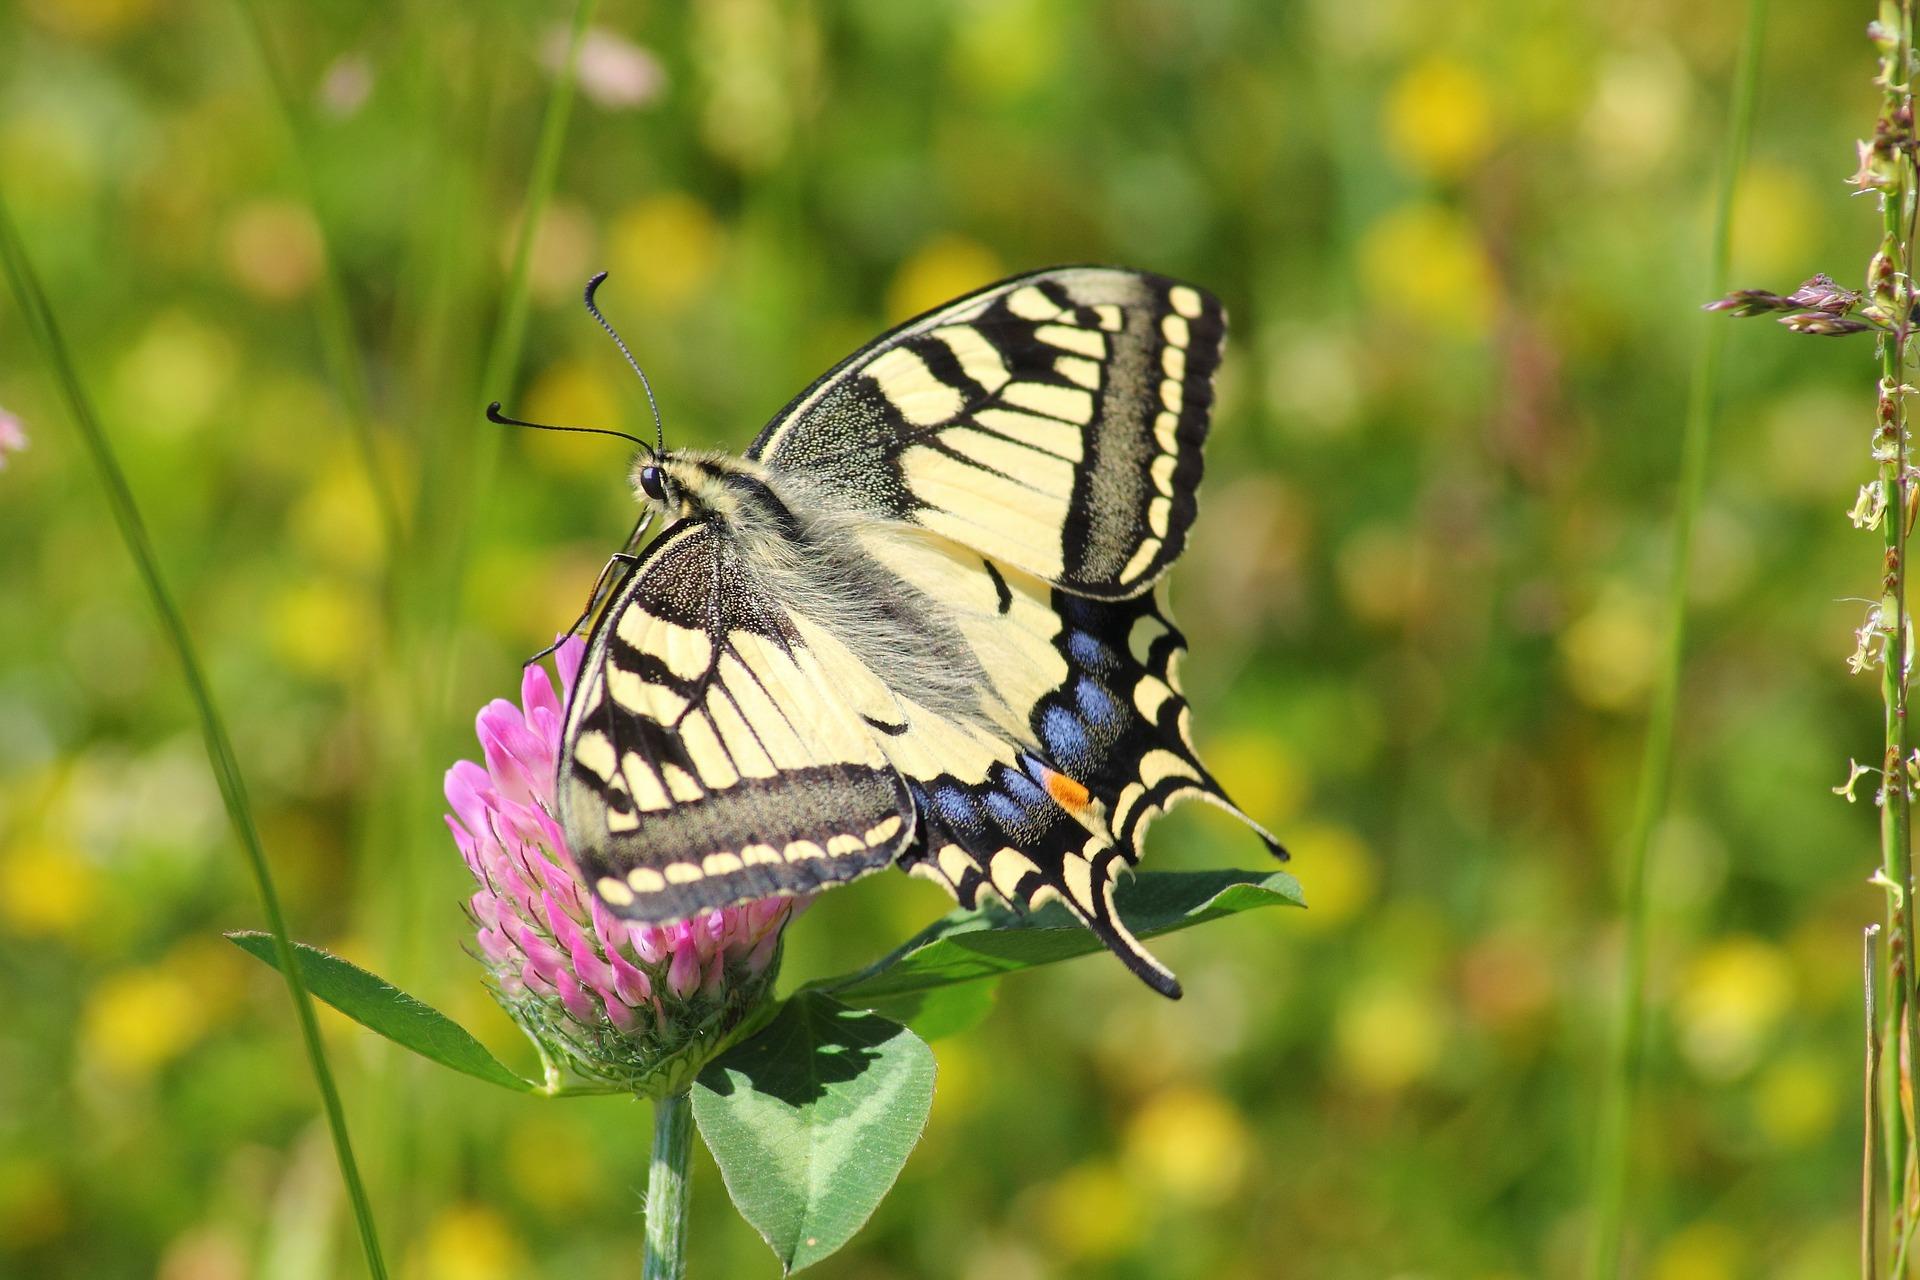 swallowtail-butterfly-364329_1920